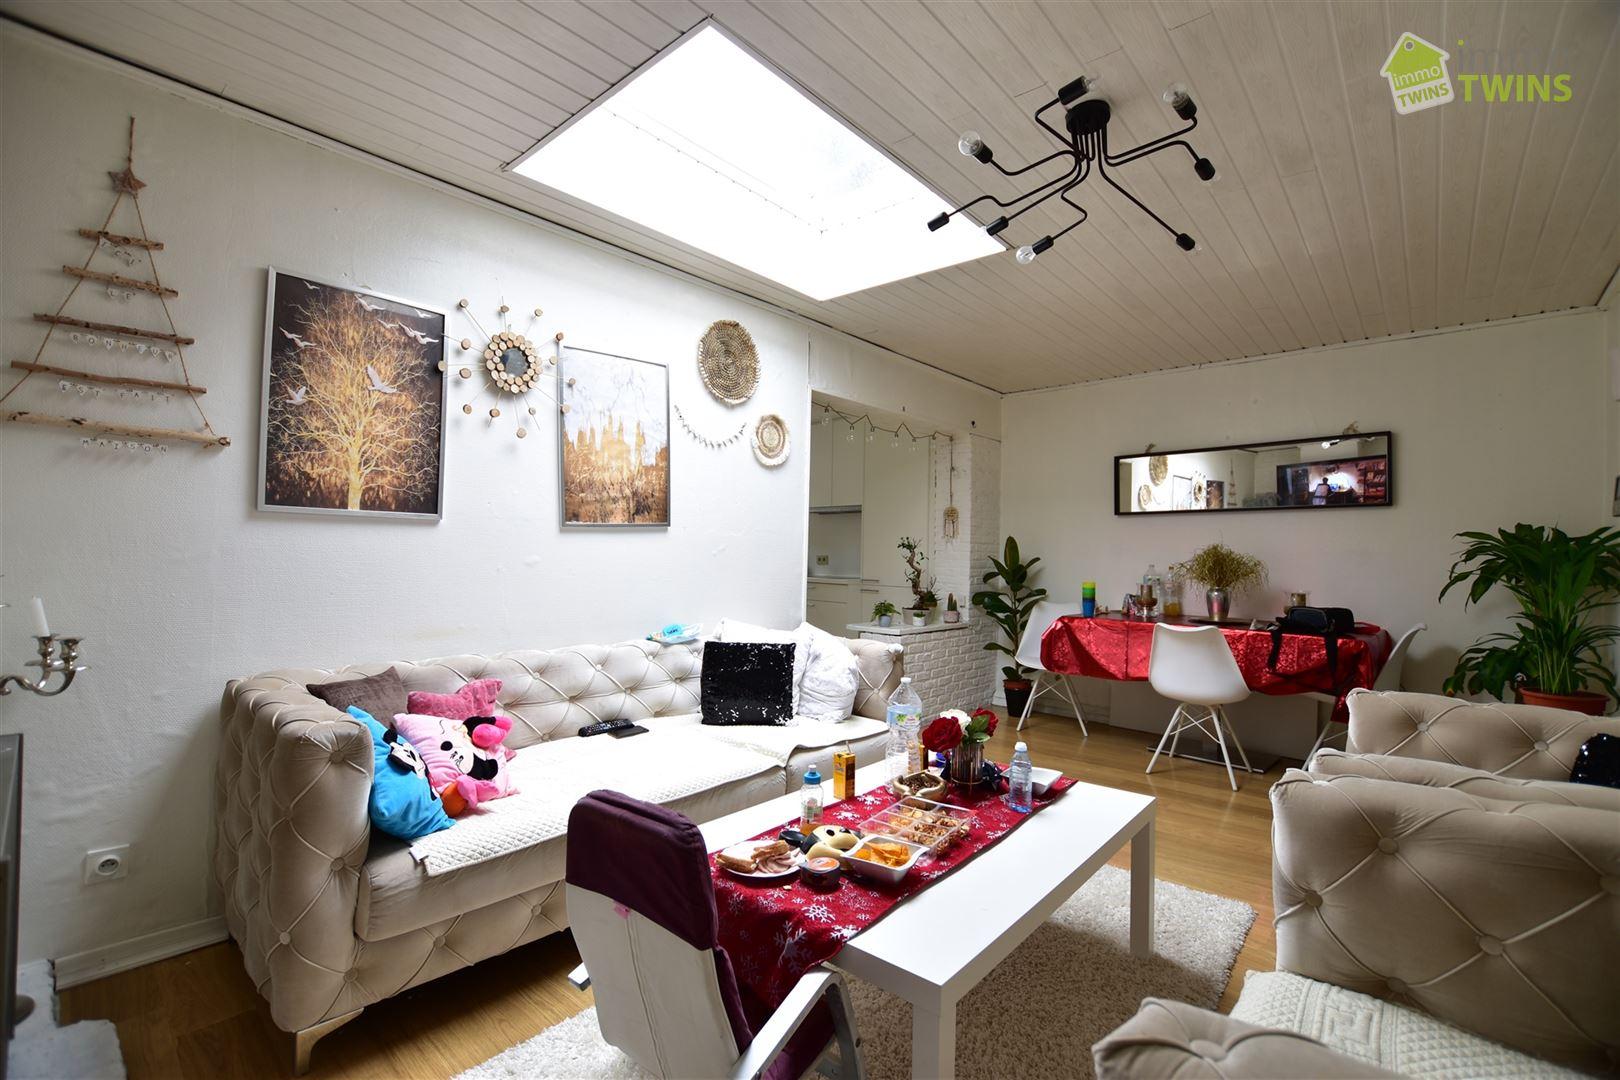 Foto 8 : Woning te 9200 Sint-Gillis-bij-Dendermonde (België) - Prijs € 585